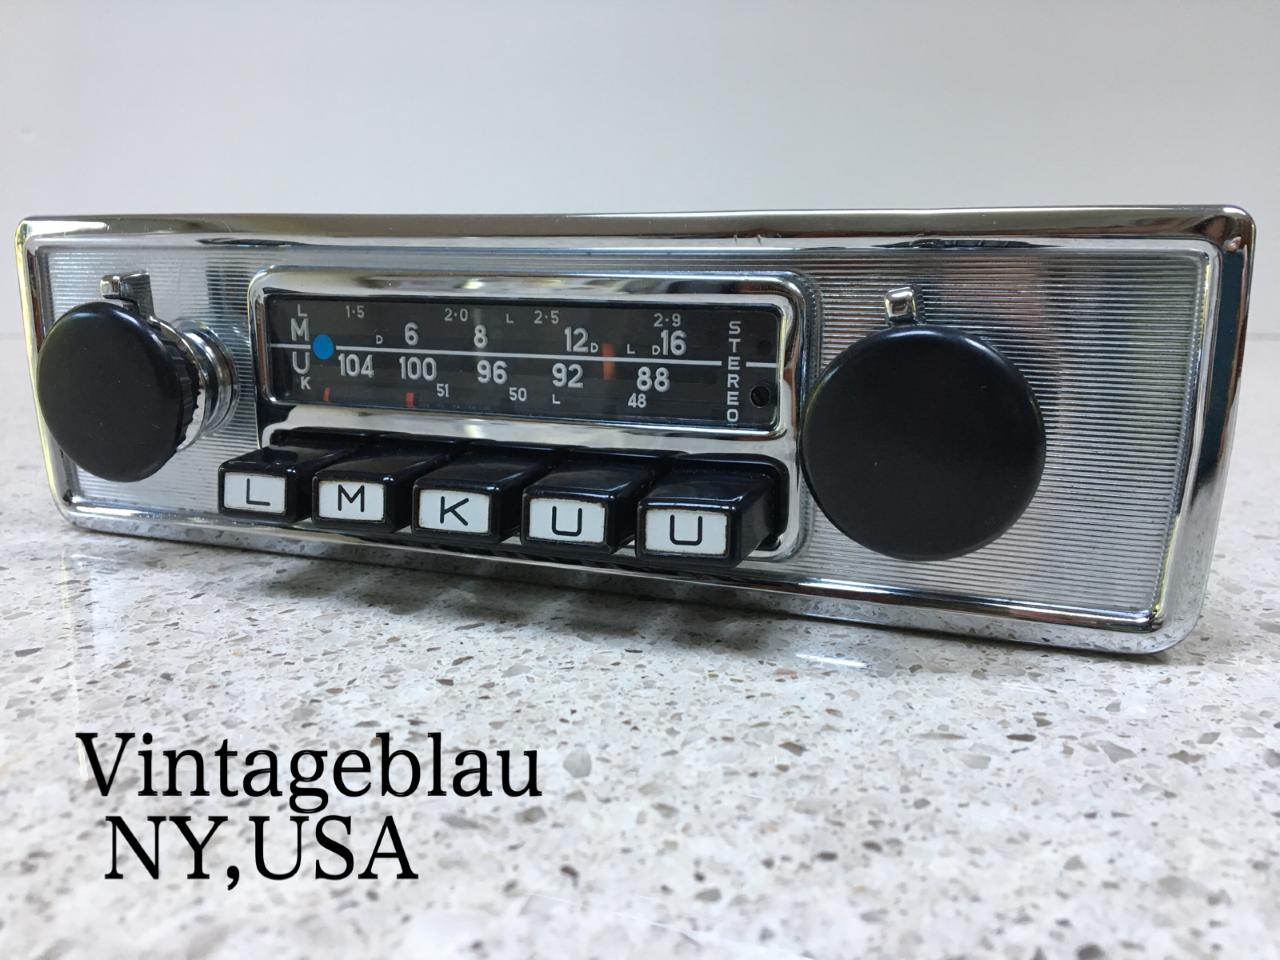 Vintageblau Classic Car Radios - Vintage Blaupunkt Radios For ...